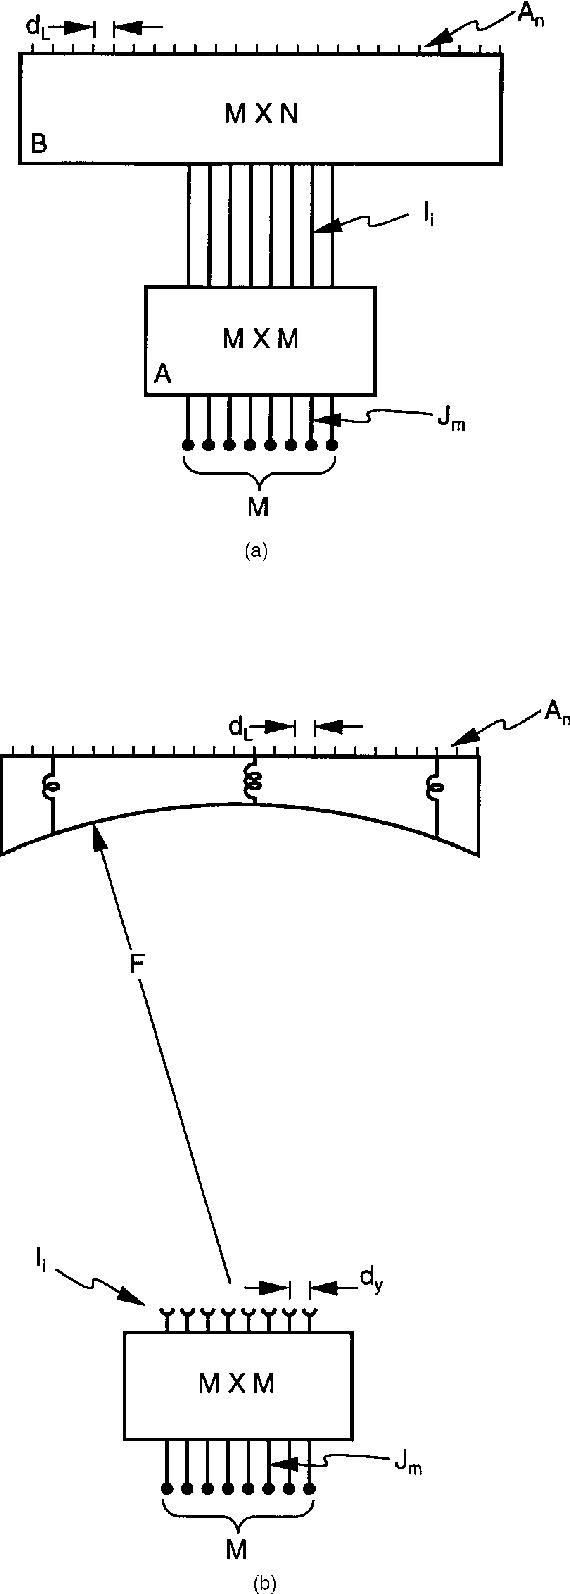 figure 8.22